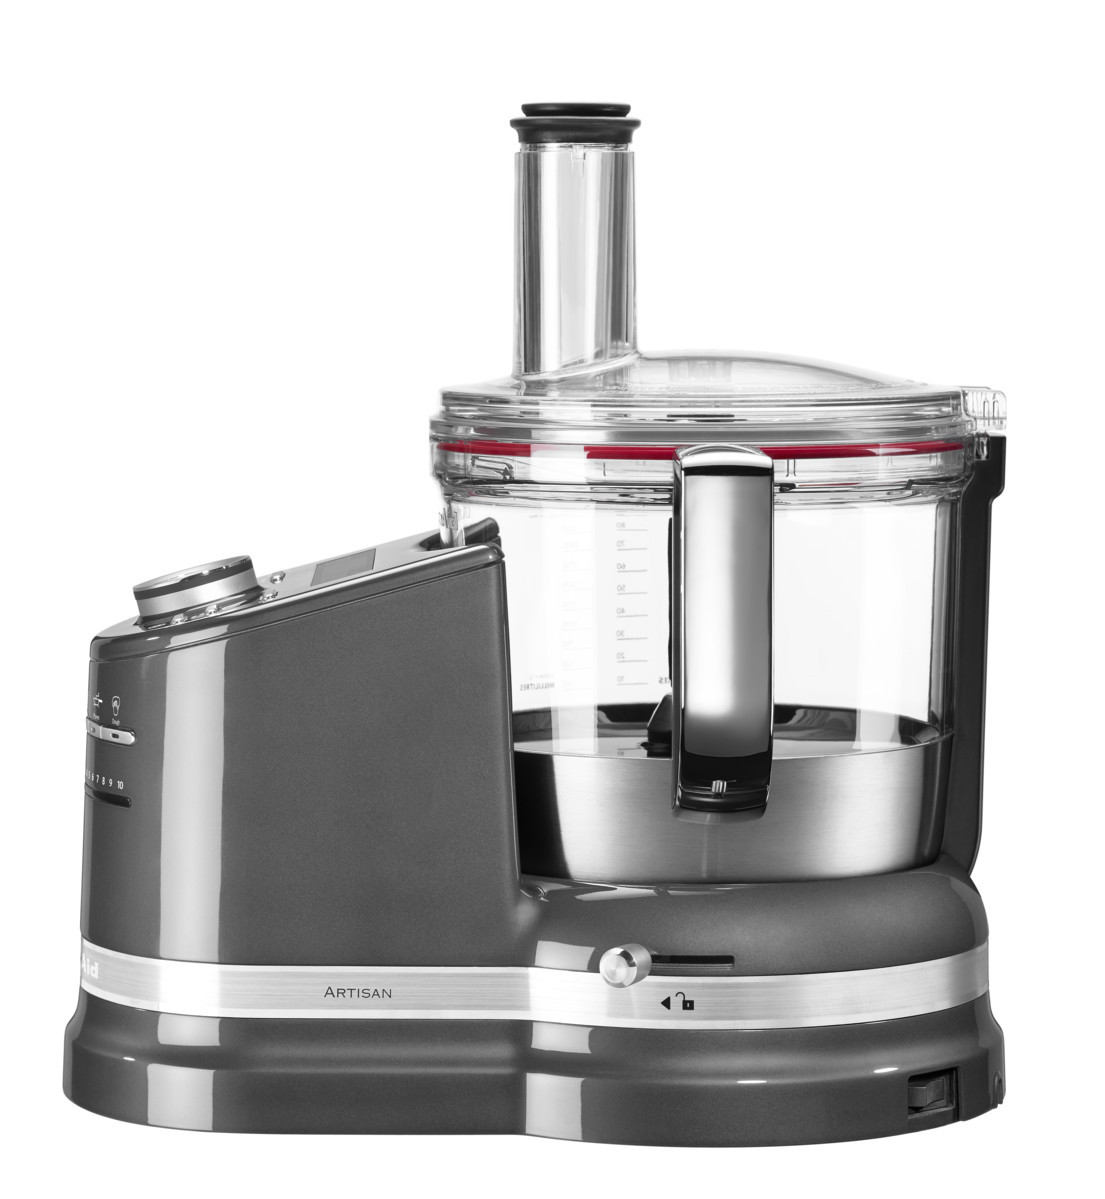 KitchenAid Artisan Cook Processor mit Foodprocessor 5KZFP11 im Set